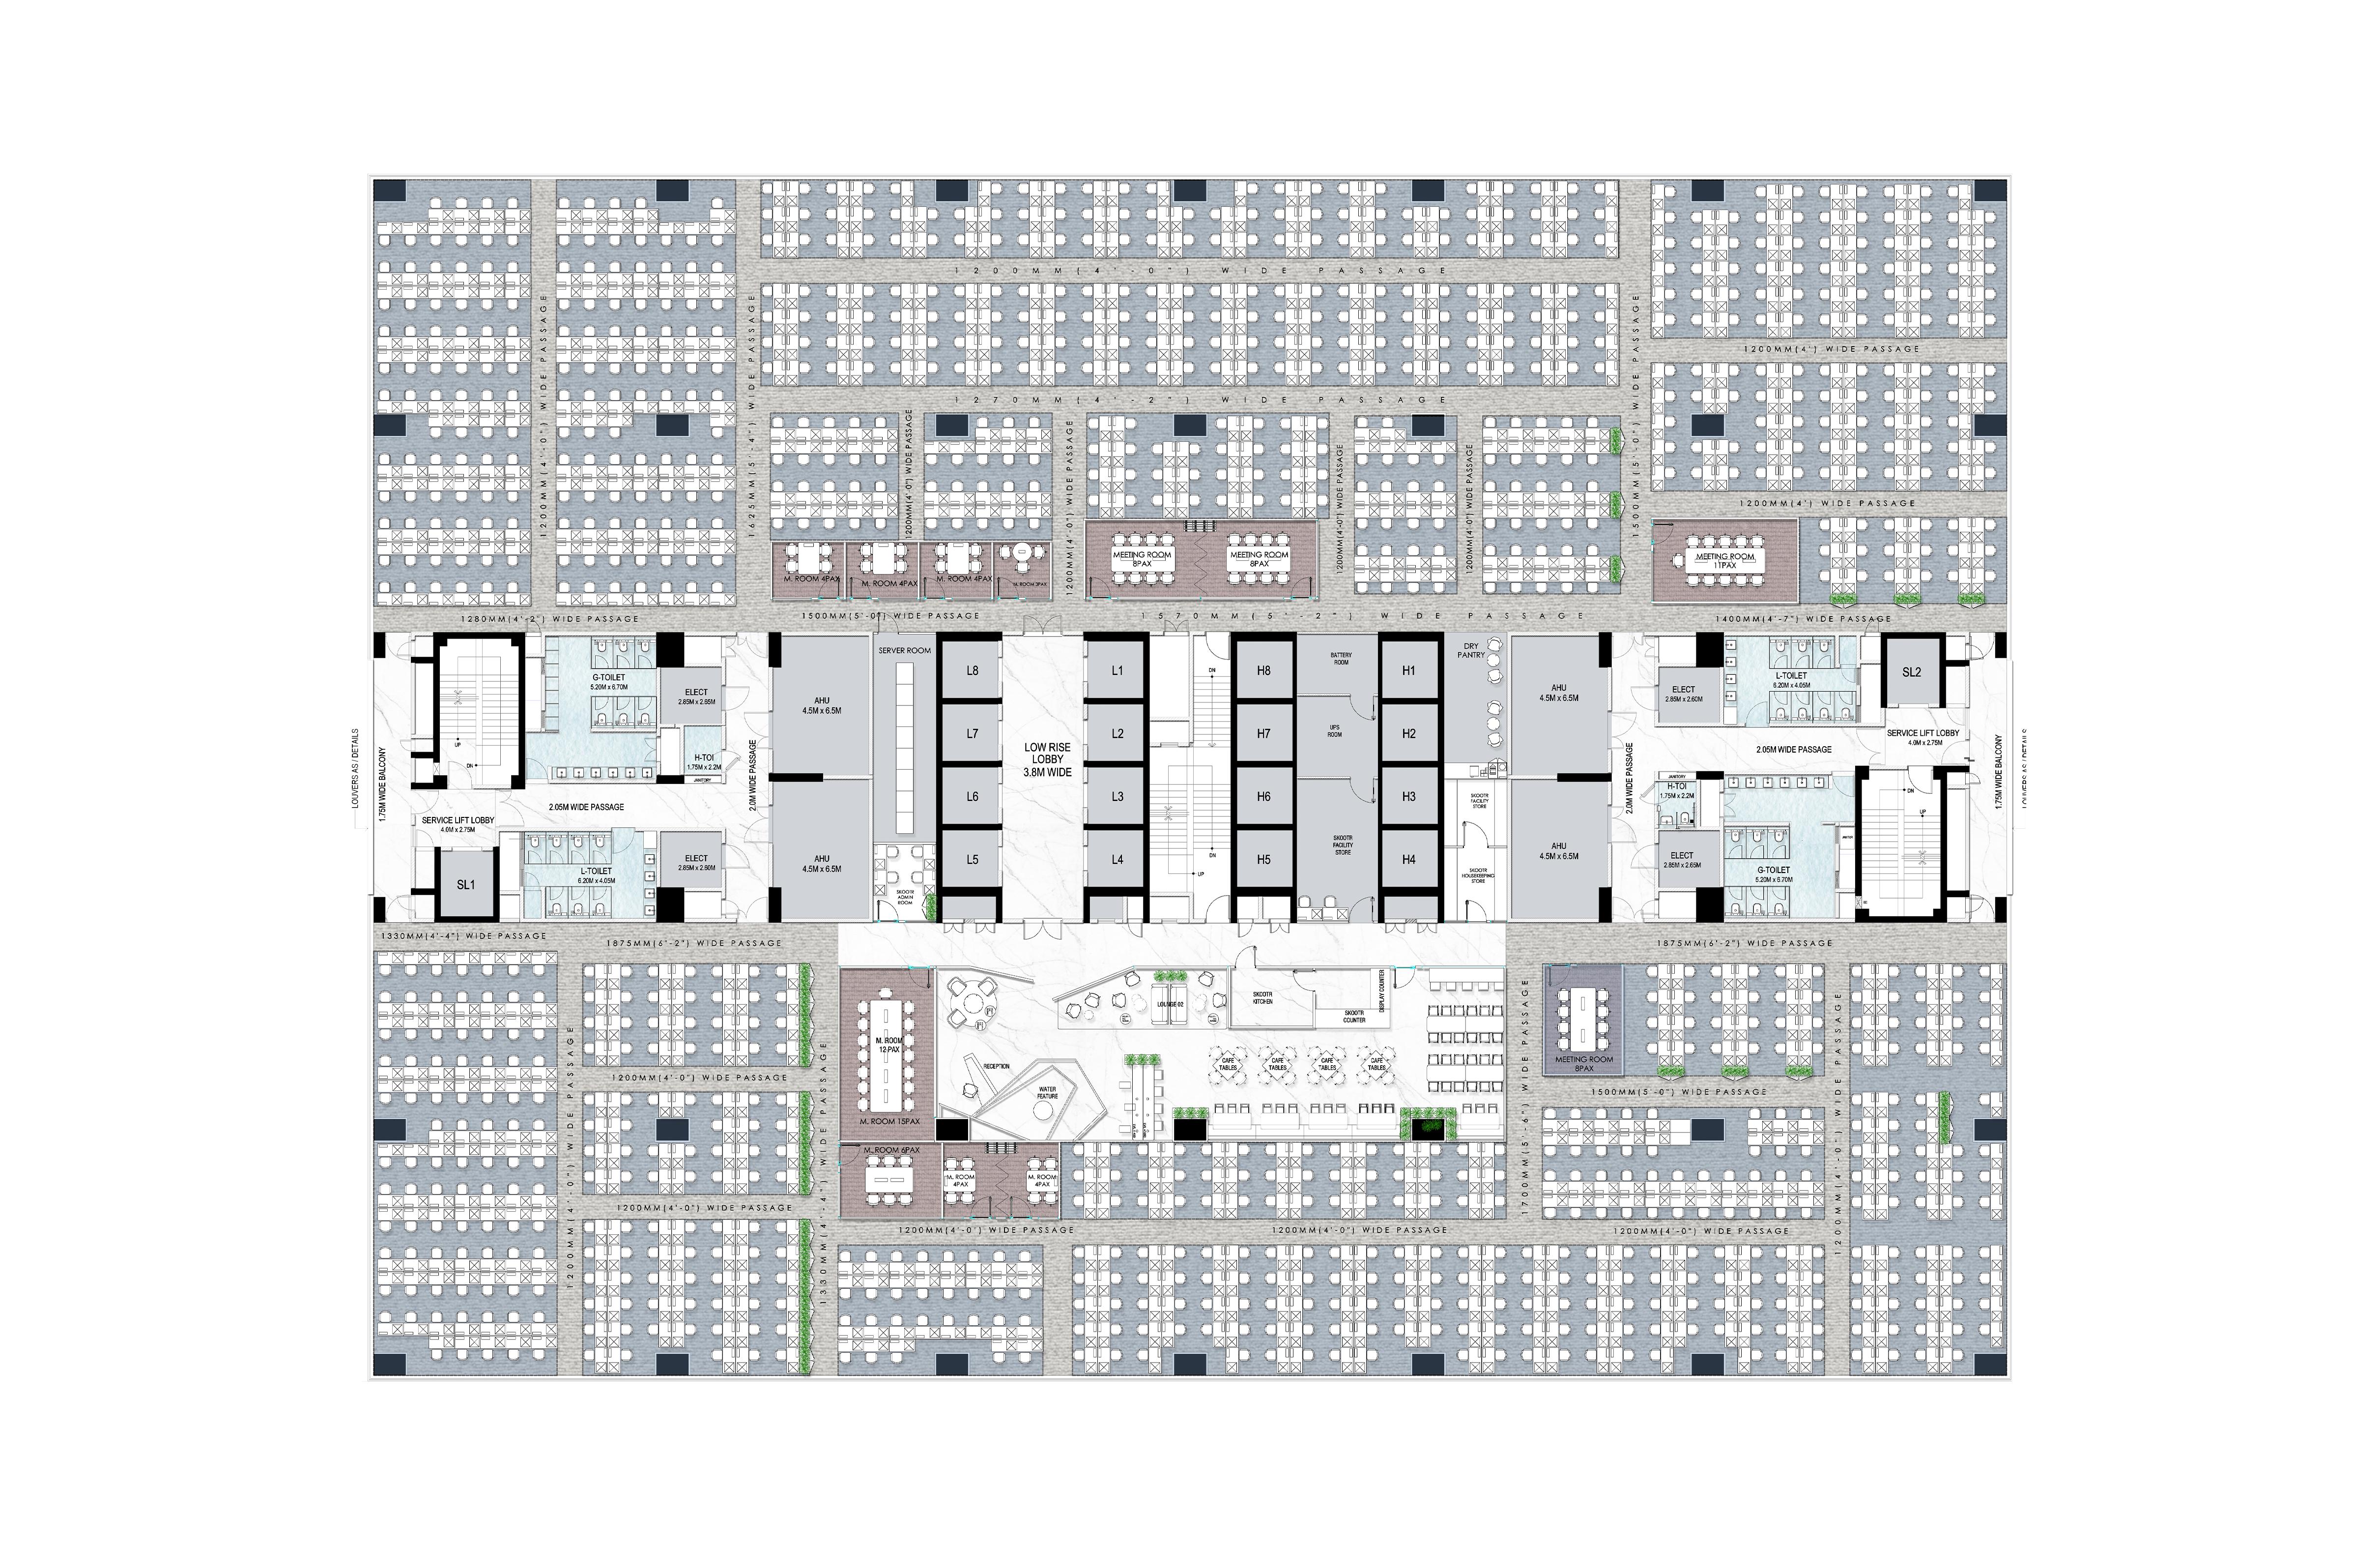 My Home Twitza Layout Plan